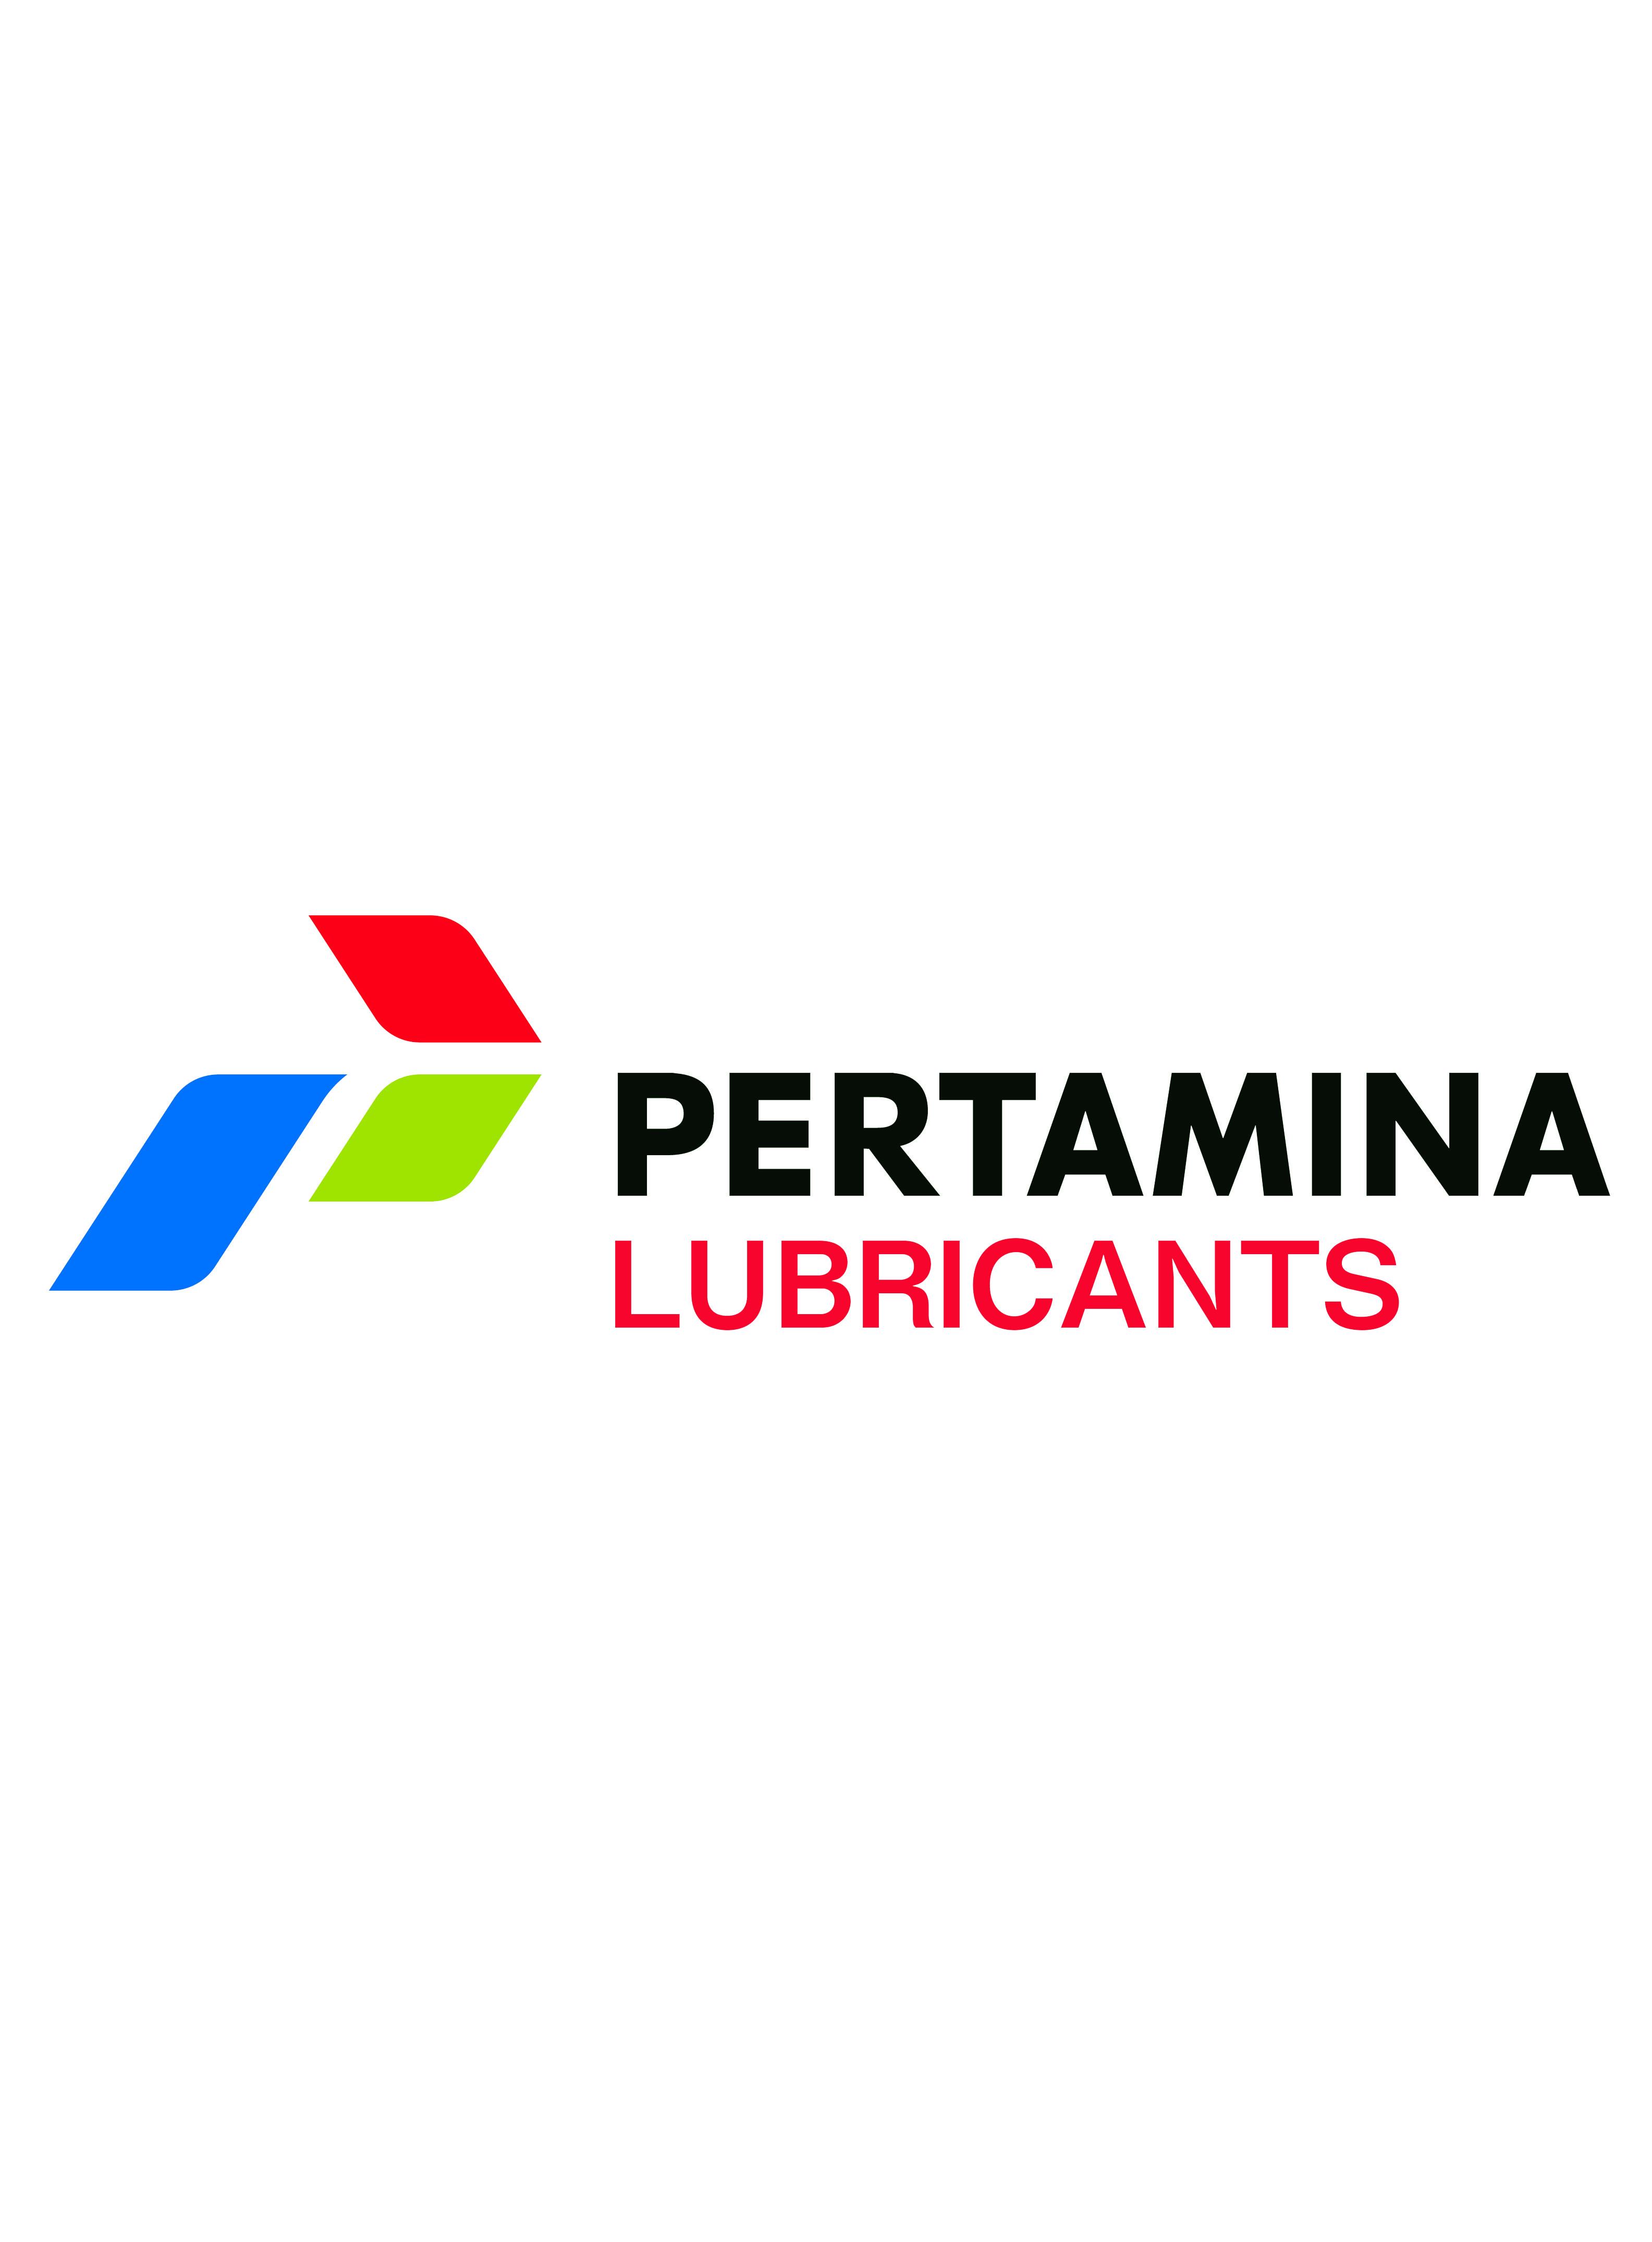 PERTAMINA LUBRICANTS